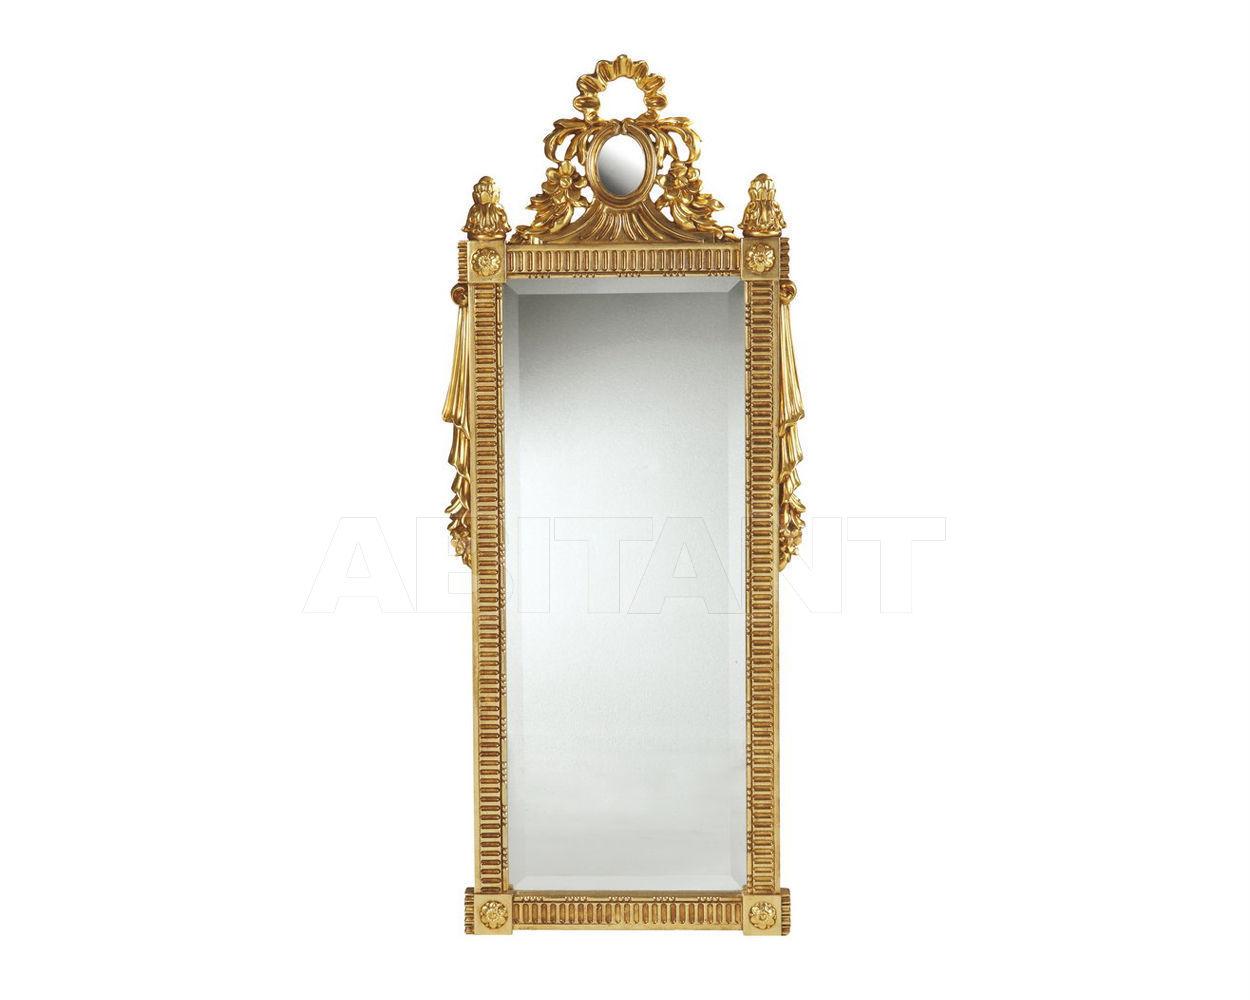 Купить Зеркало настенное Colombostile s.p.a. 2010 0130 SP